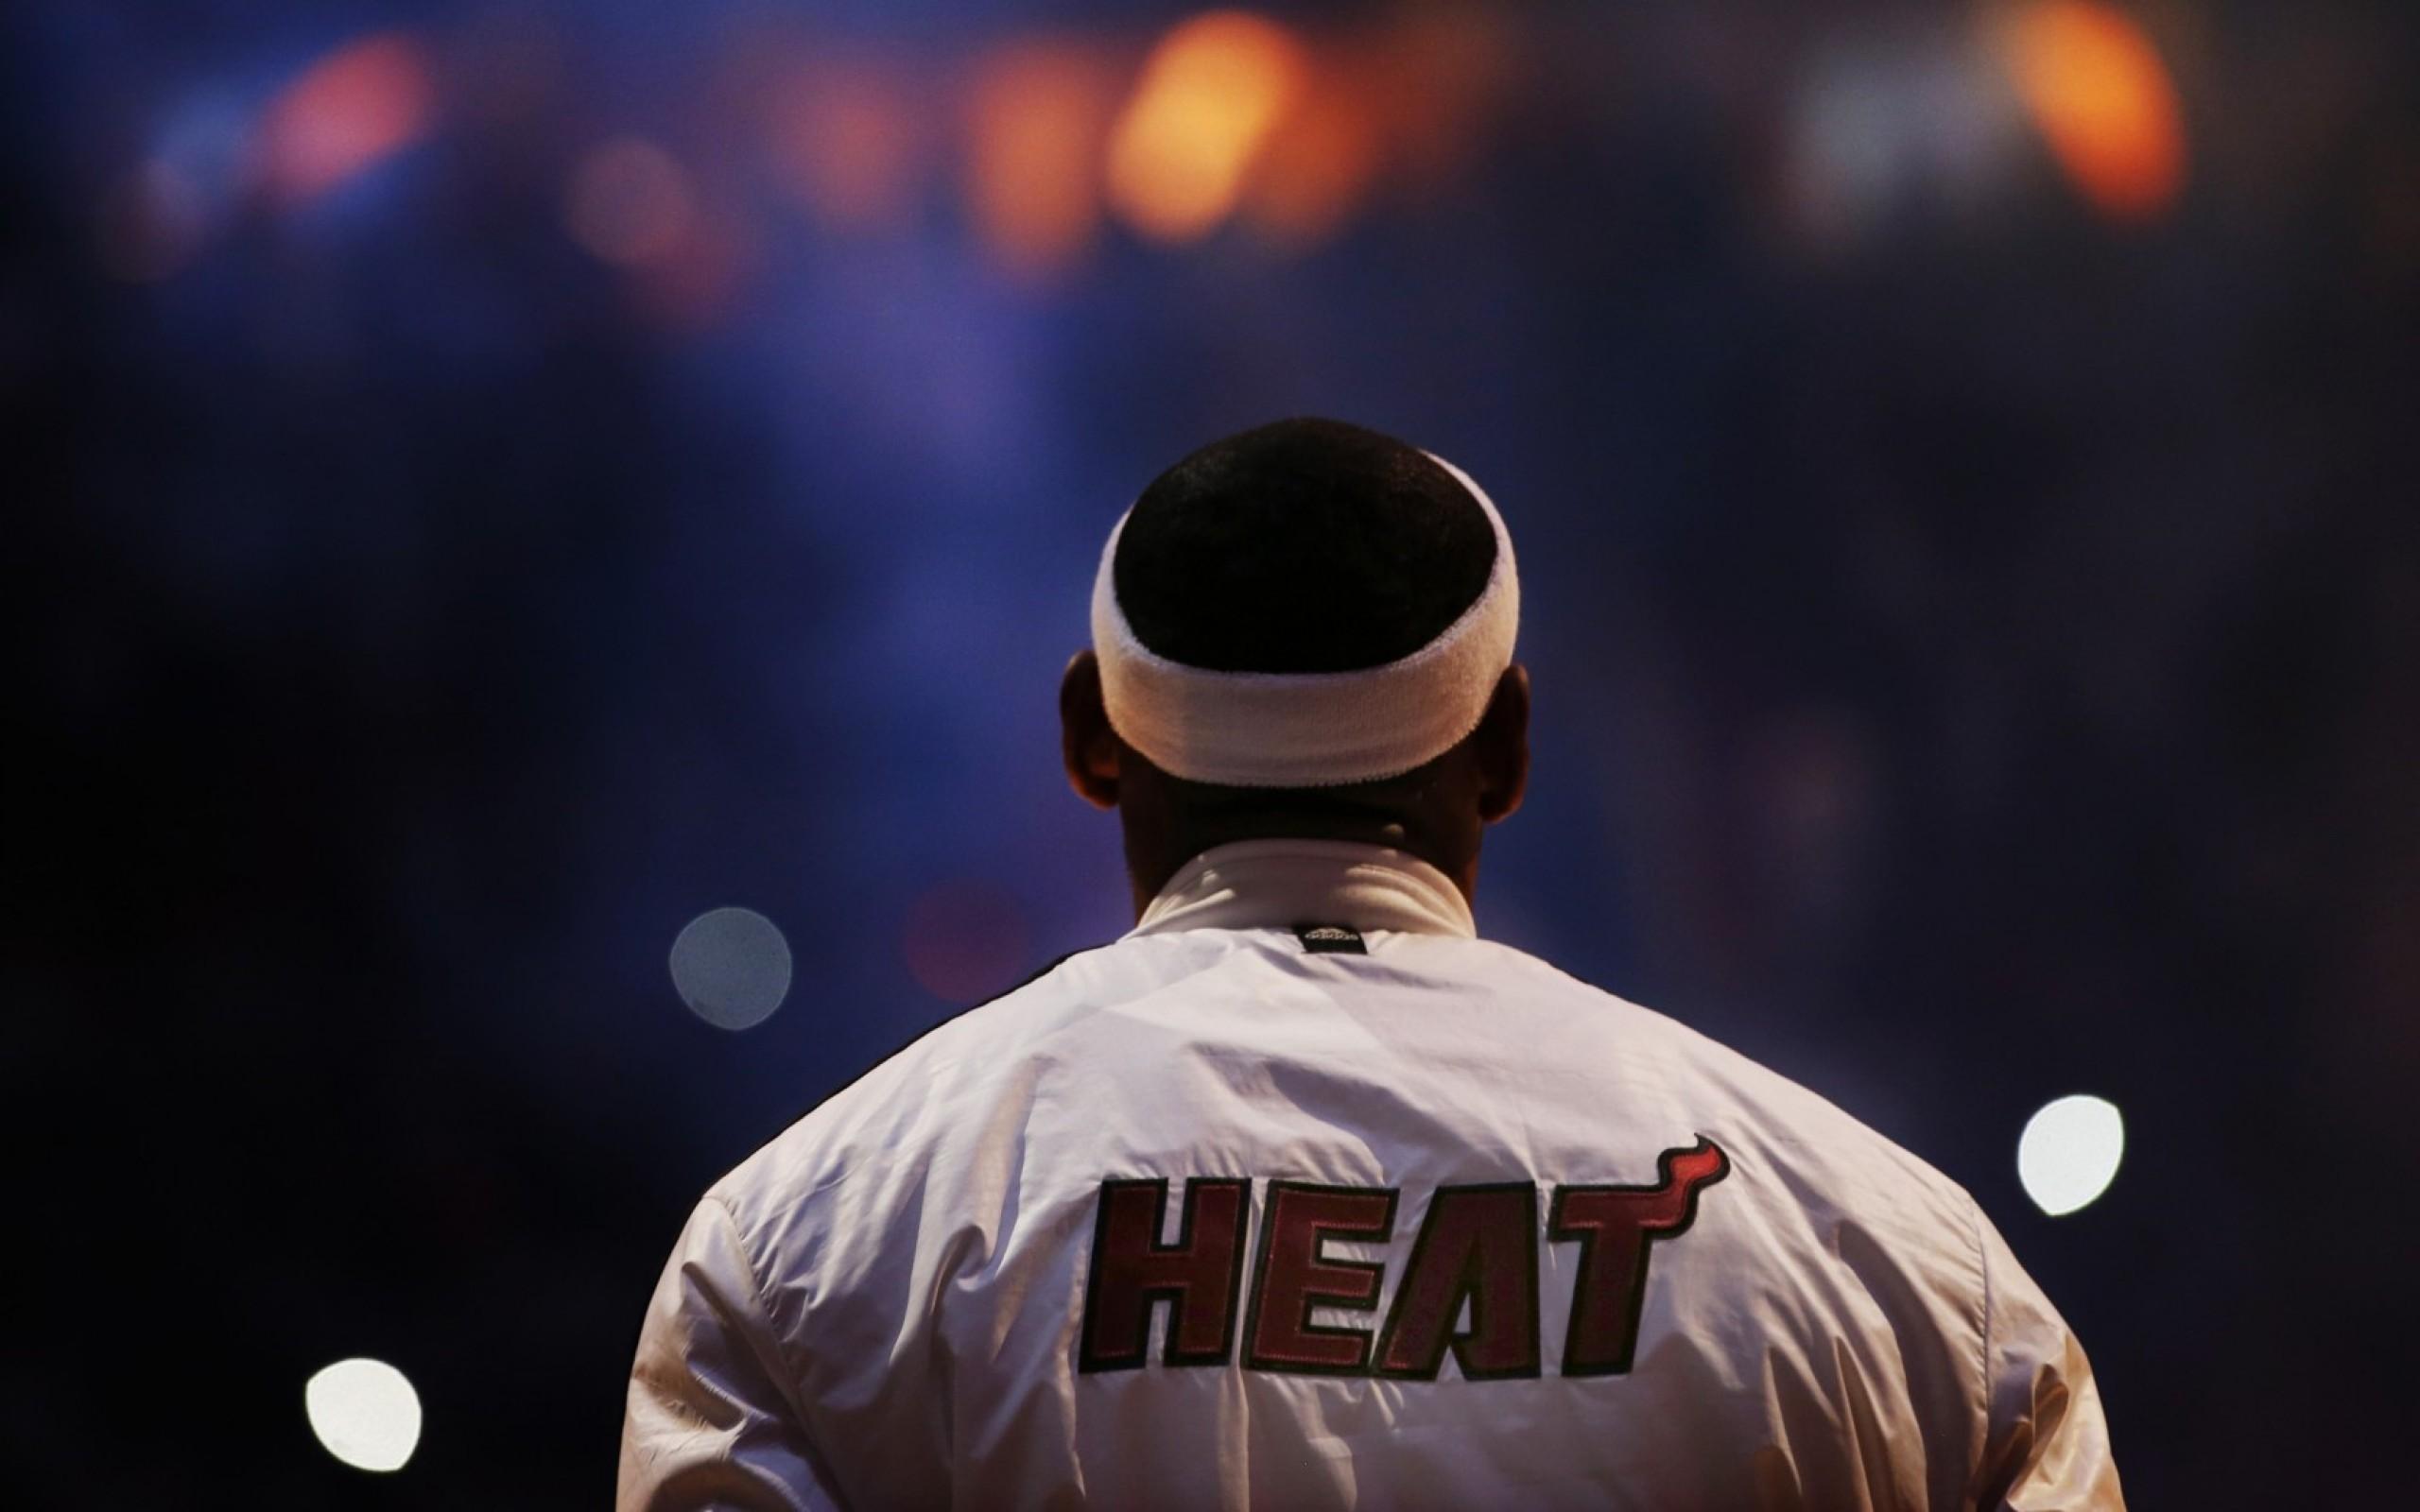 Wallpaper lebron james, miami heat, basketball, sports, nba